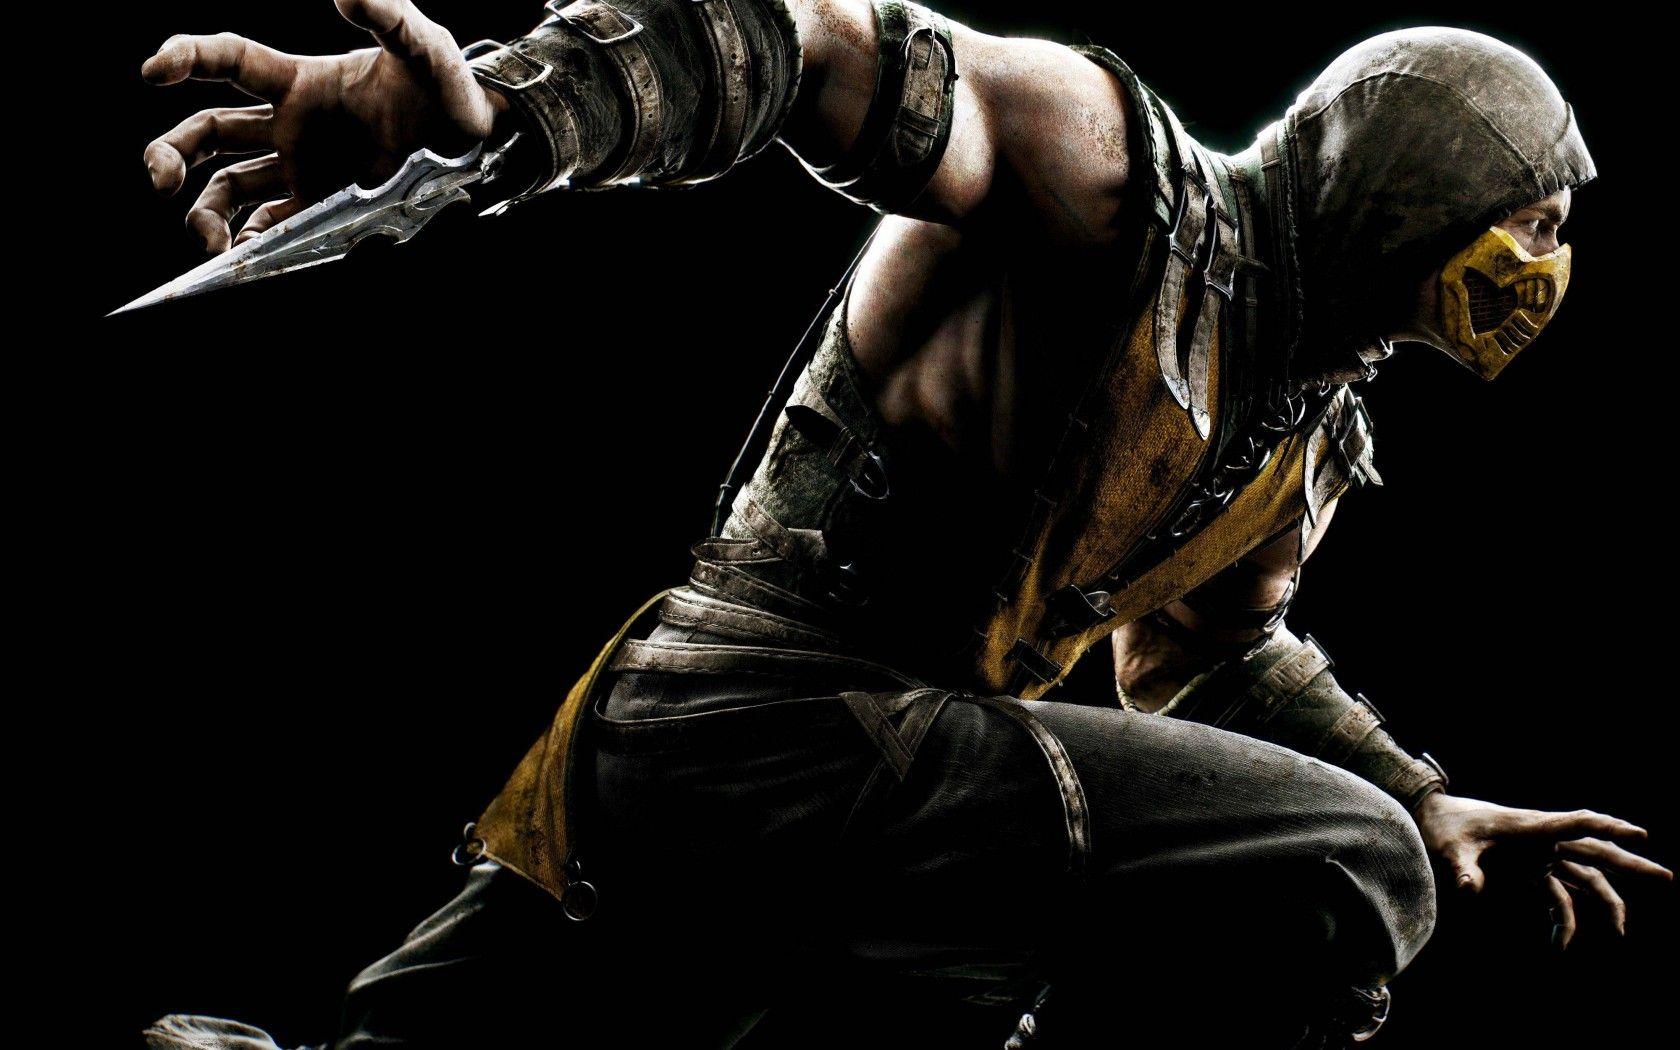 Mortal Kombat Wallpaper Scorpion 11 Mortal Kombat Games Fan